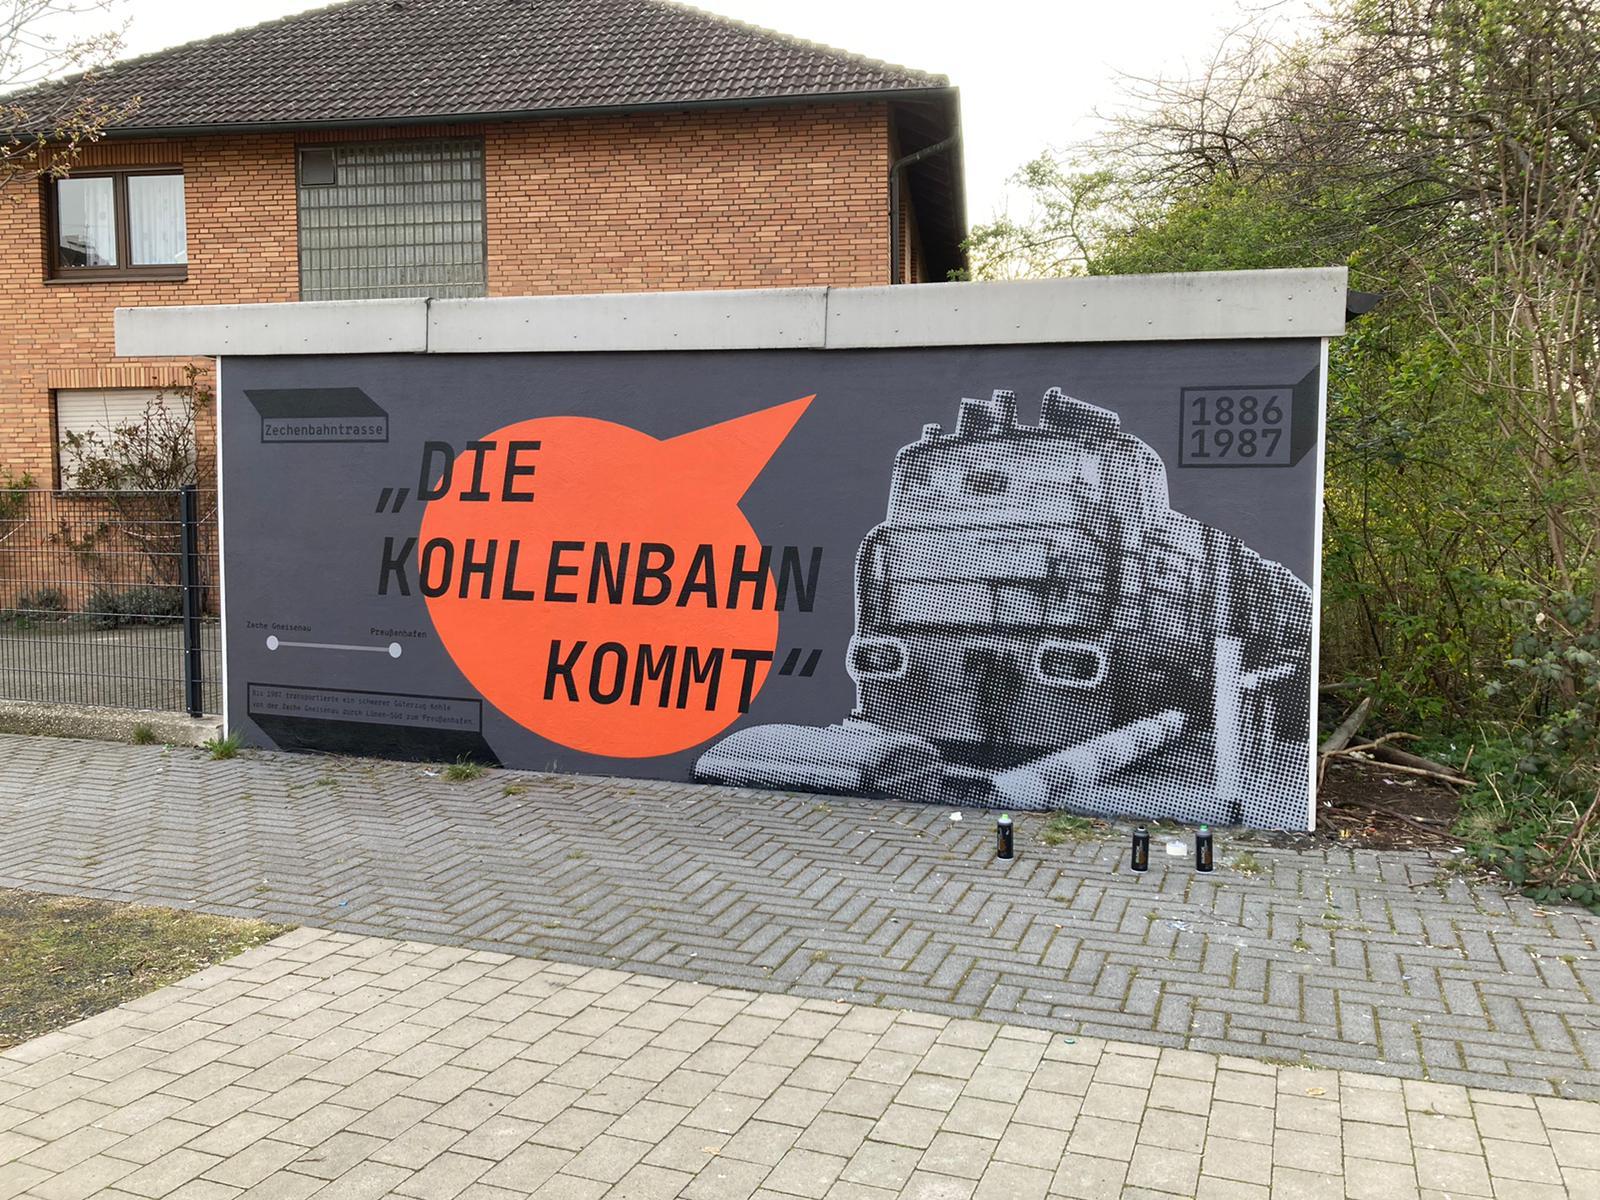 "Erstes Ergebnis des Kunstprojektes ""Urban Art in Lünen-Süd"" am Bürgerplatz sichtbar"